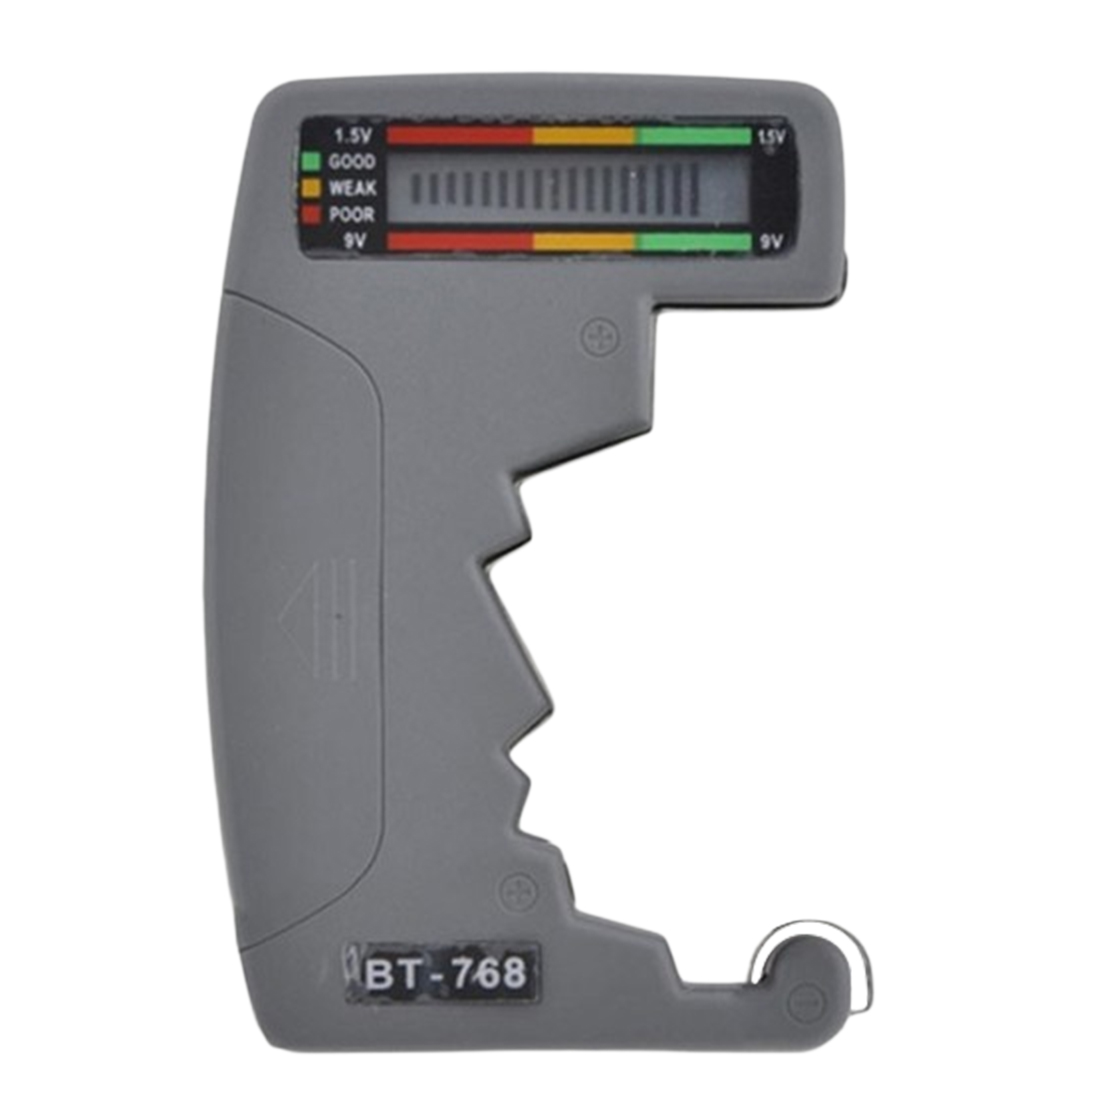 Universal LCD Digital Battery Tester Capacity Volt Checker For testing 9V 1.5V C AA AAA D Alkaline Rechargeable Batteries